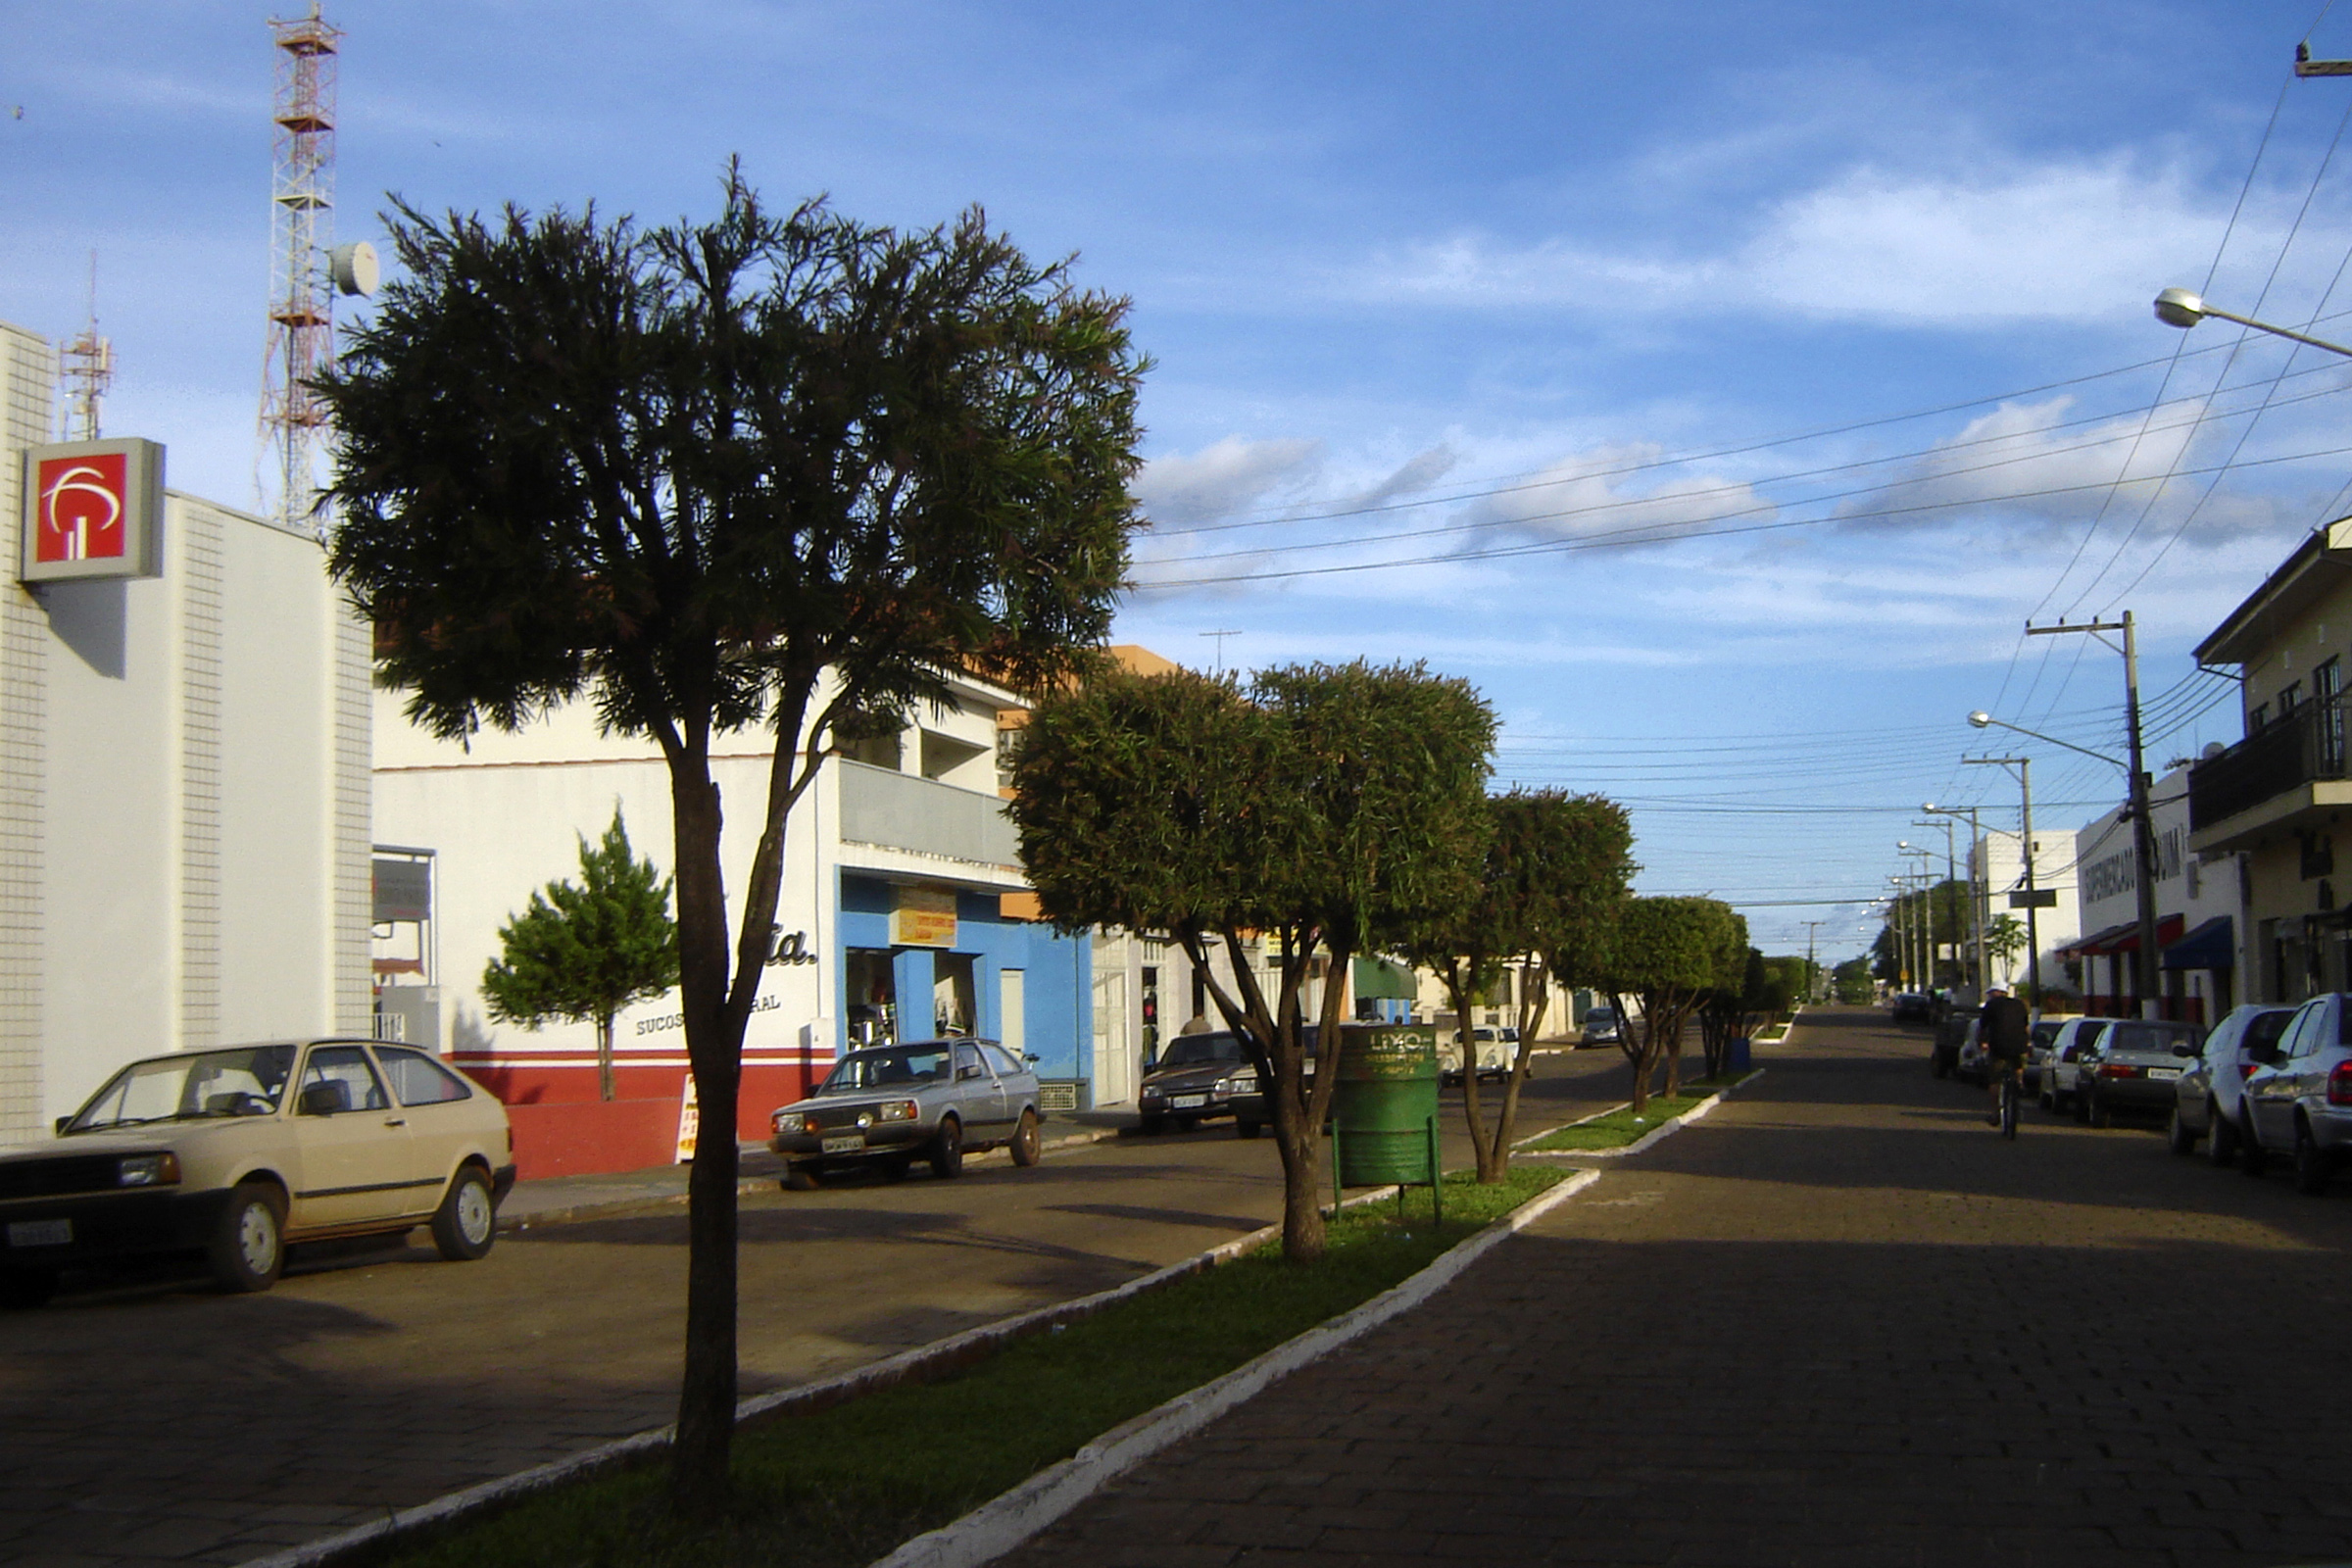 Manduri São Paulo fonte: upload.wikimedia.org